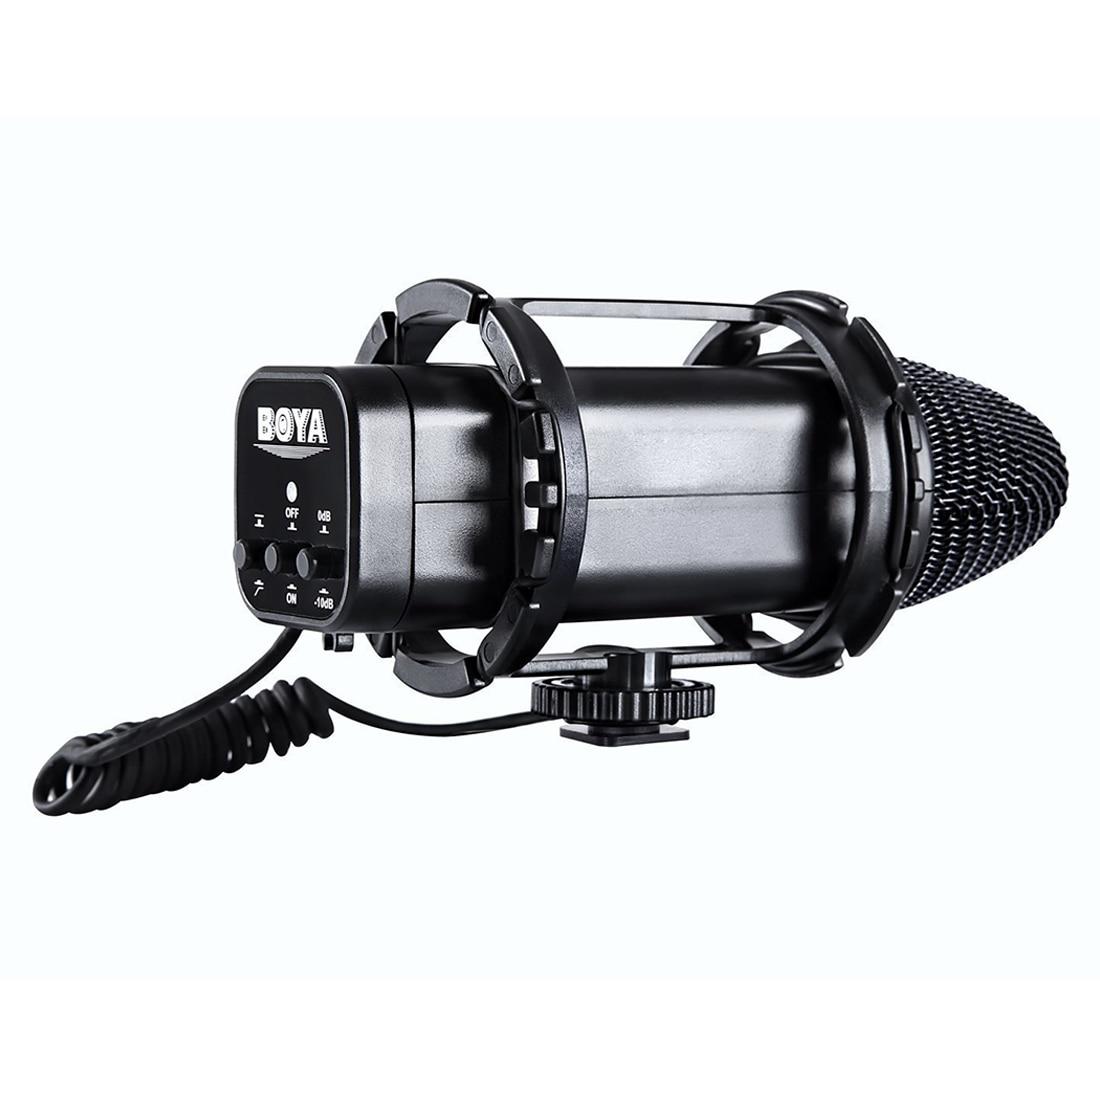 BOYA BY-V02 Camera Stereo Condensor miniphone for DSLR Canon 5D2 5D Mark III 6D 600D Nikon D800 D800E D810 D600 D300 D7000 цена 2017